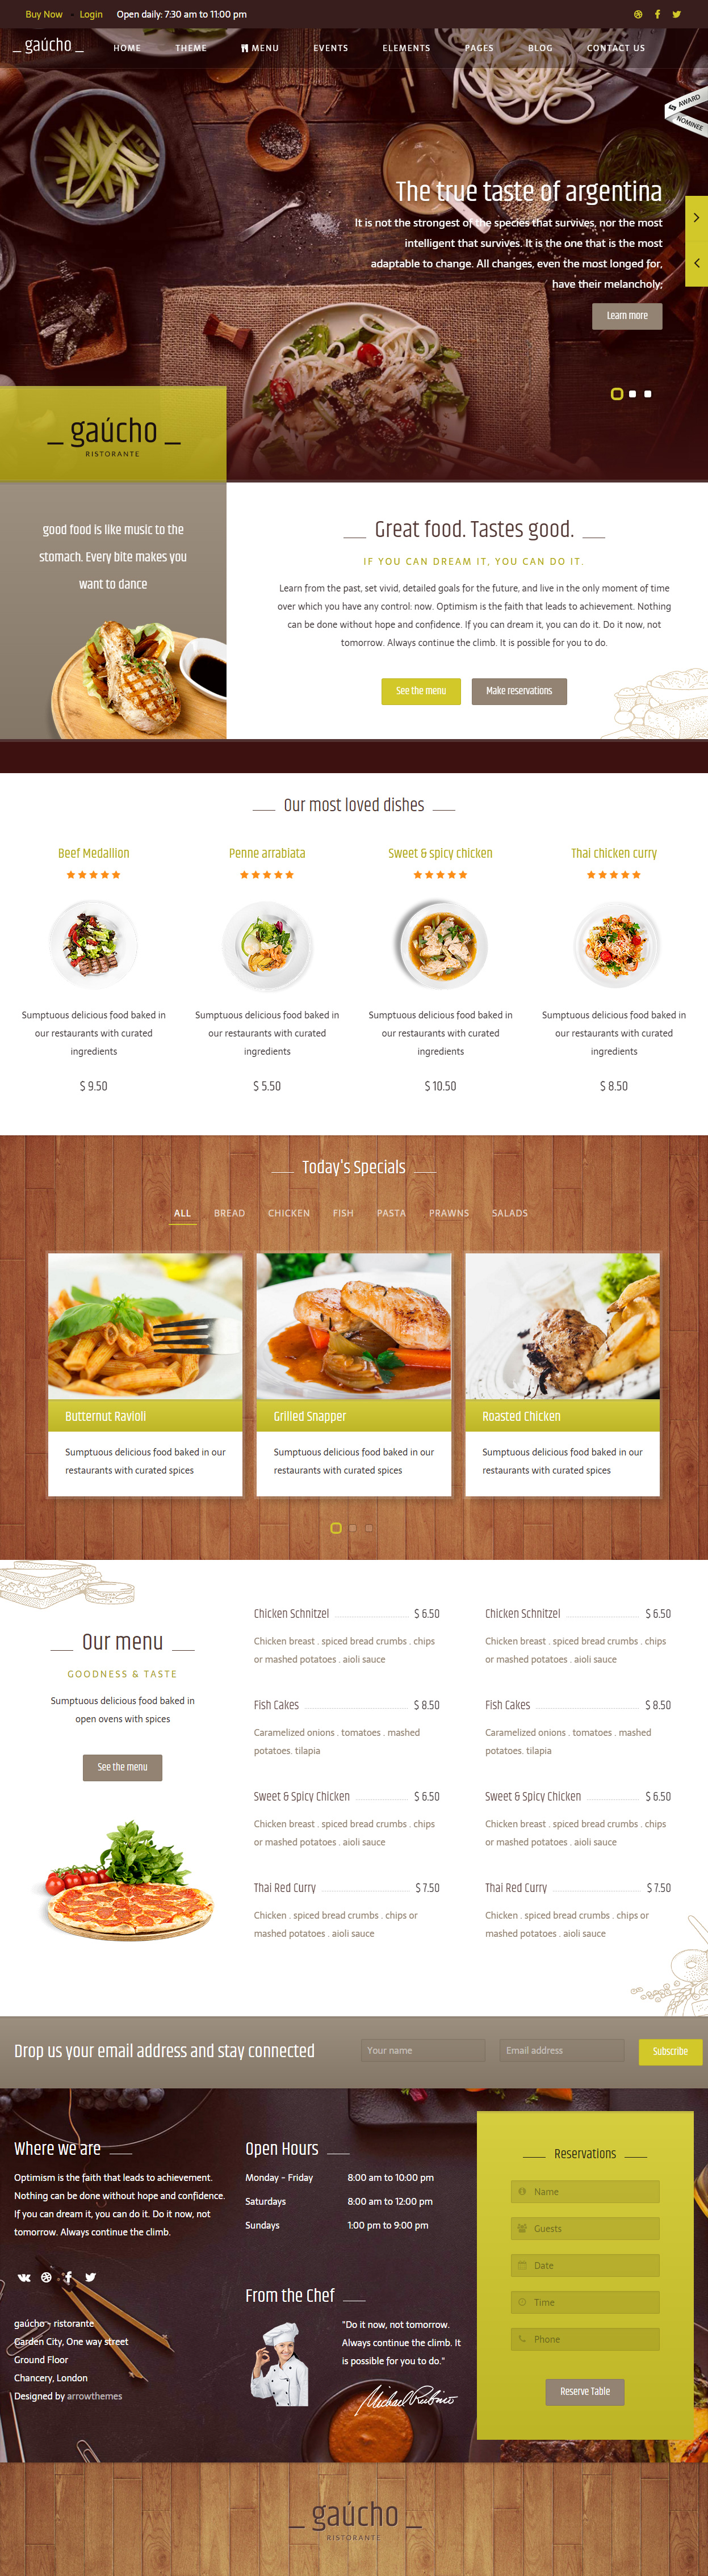 Gaucho is Premium full Responsive Retina Parallax Food HTML5 ...